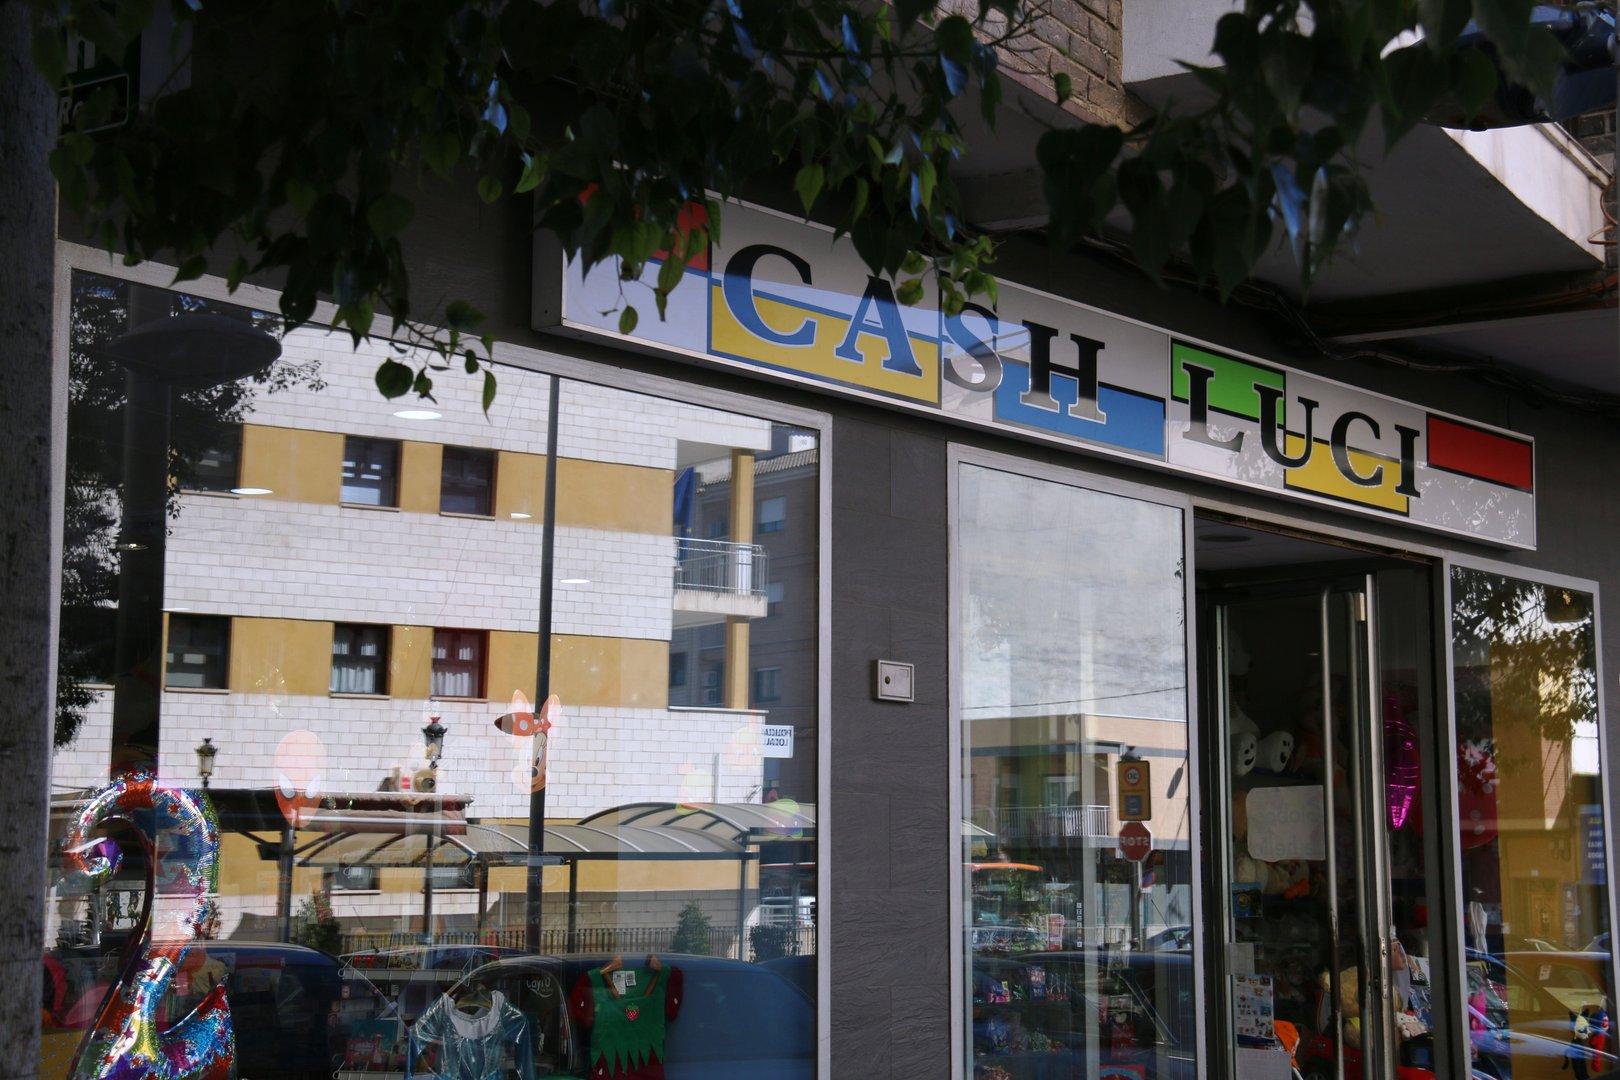 Juguetería Cash Luci